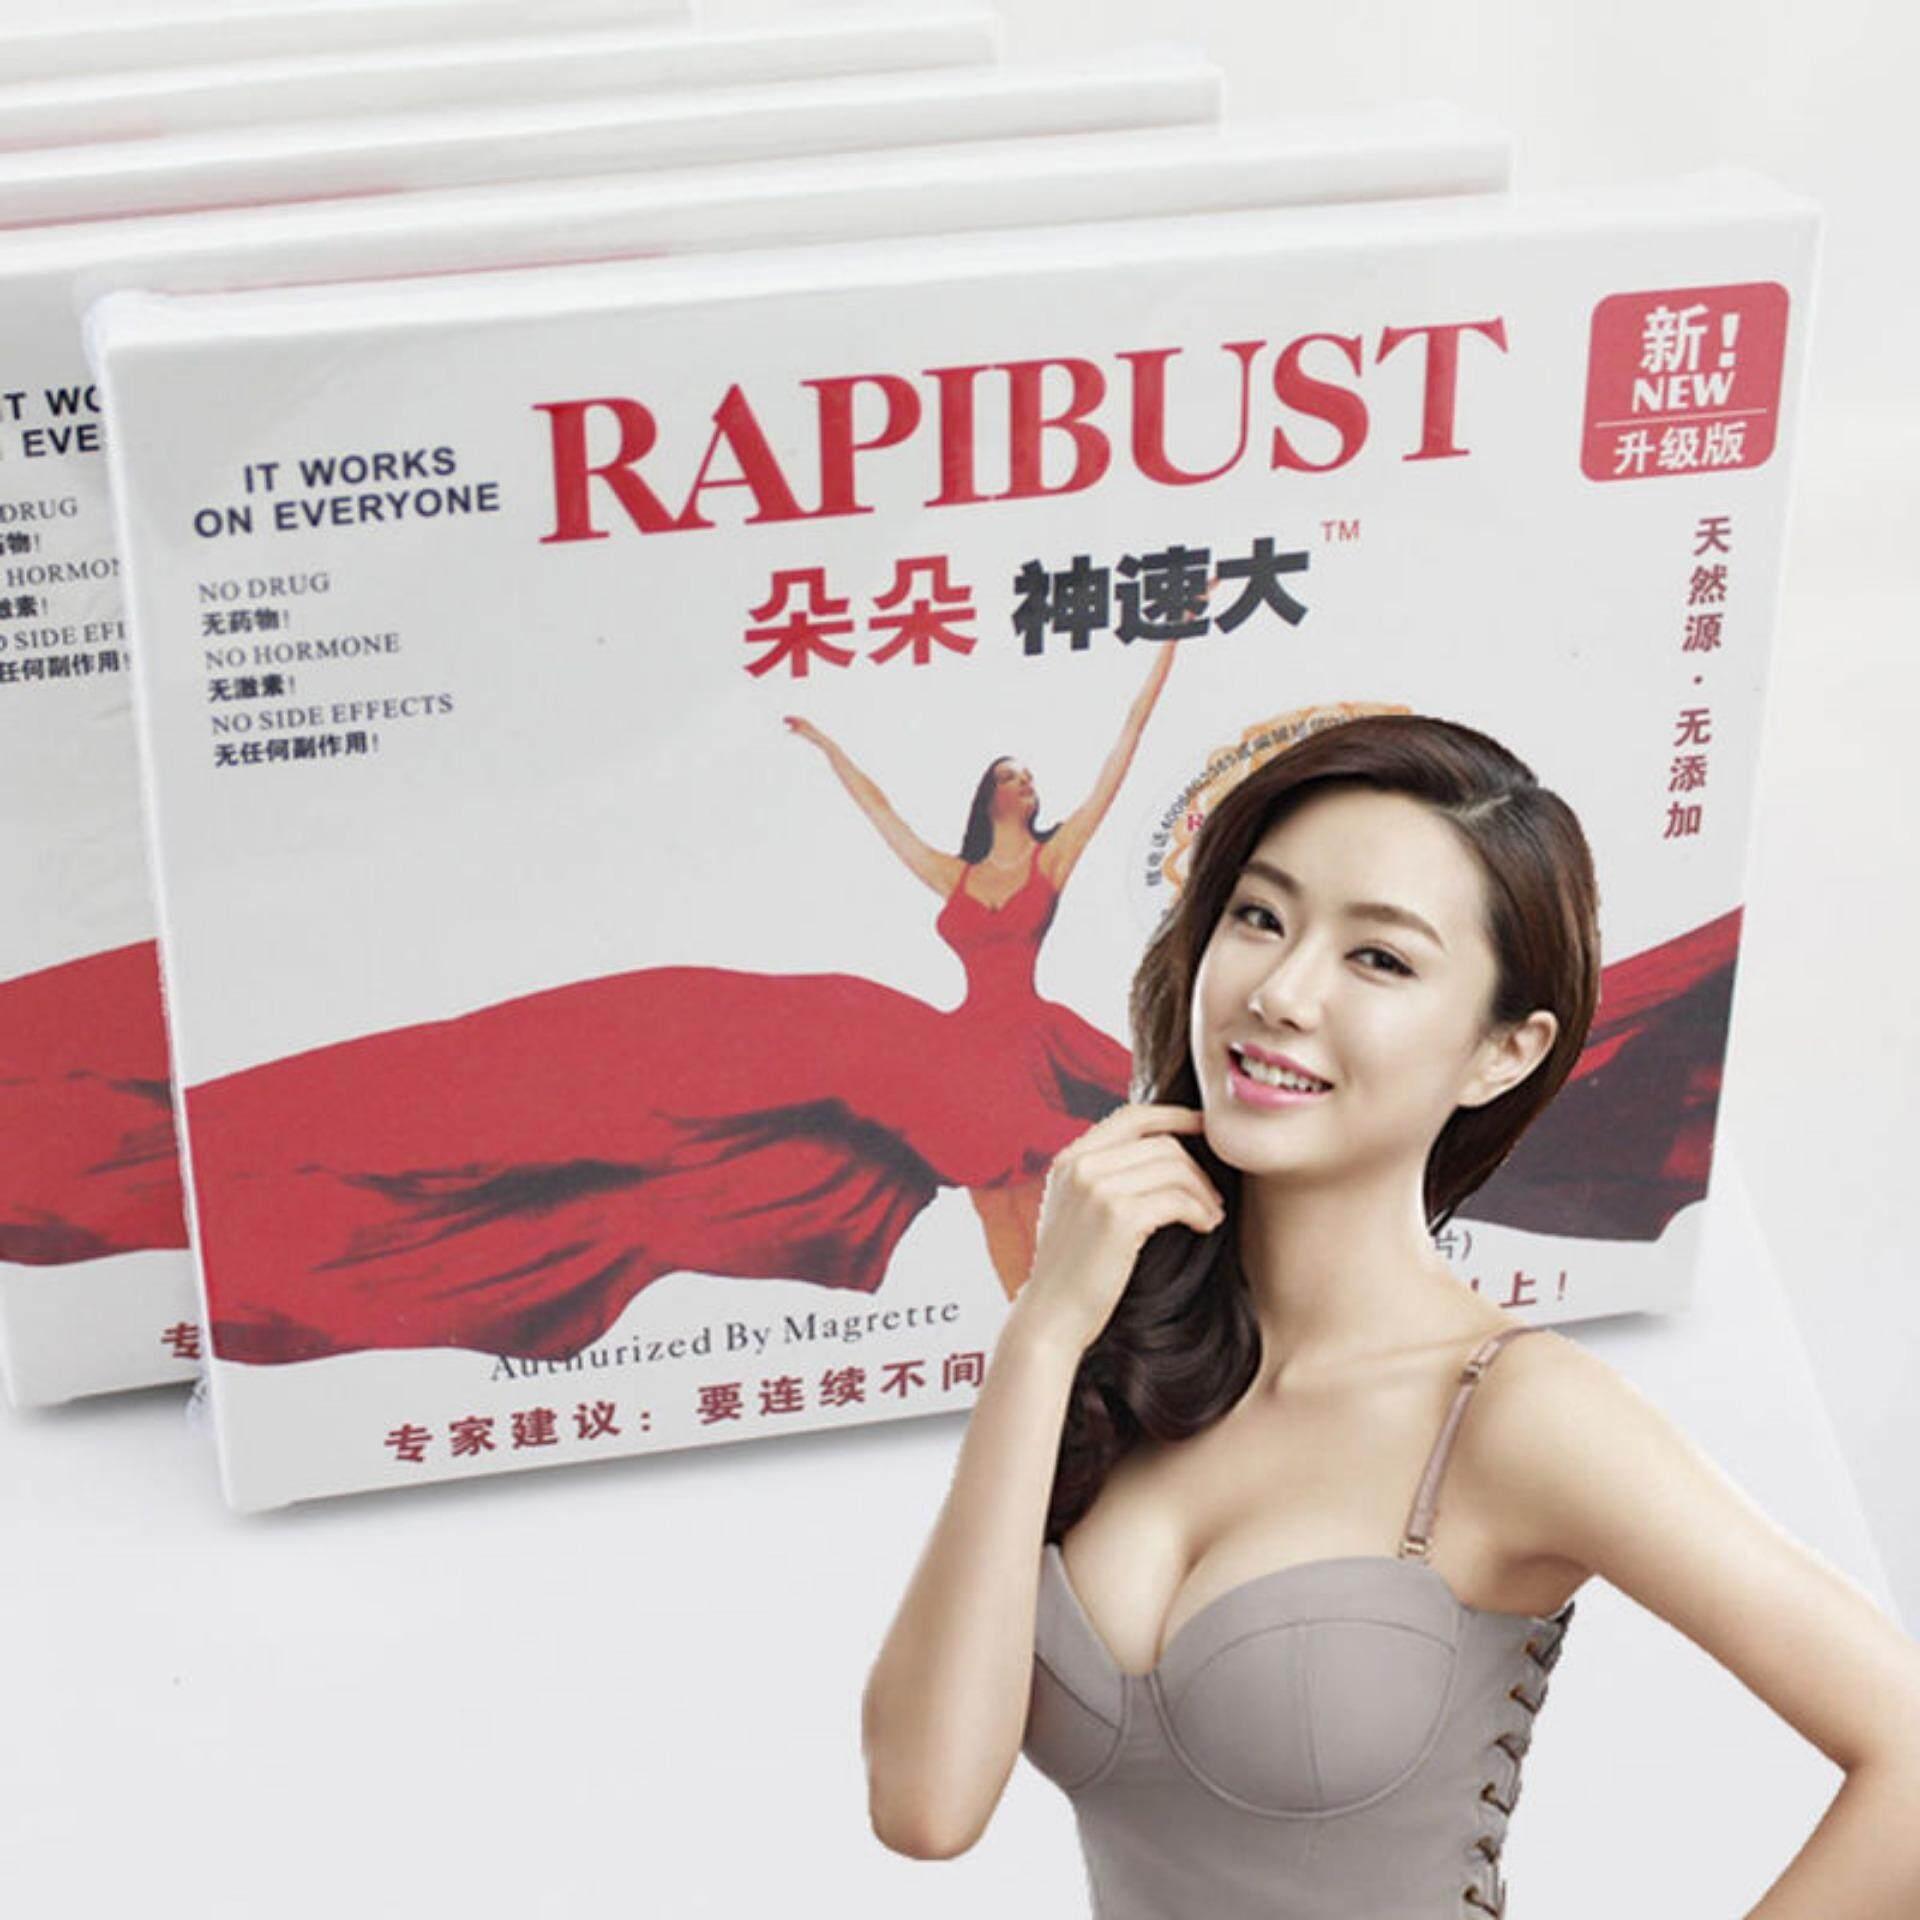 RAPIBUST (15 Boxes) Breast Enlargement Mask